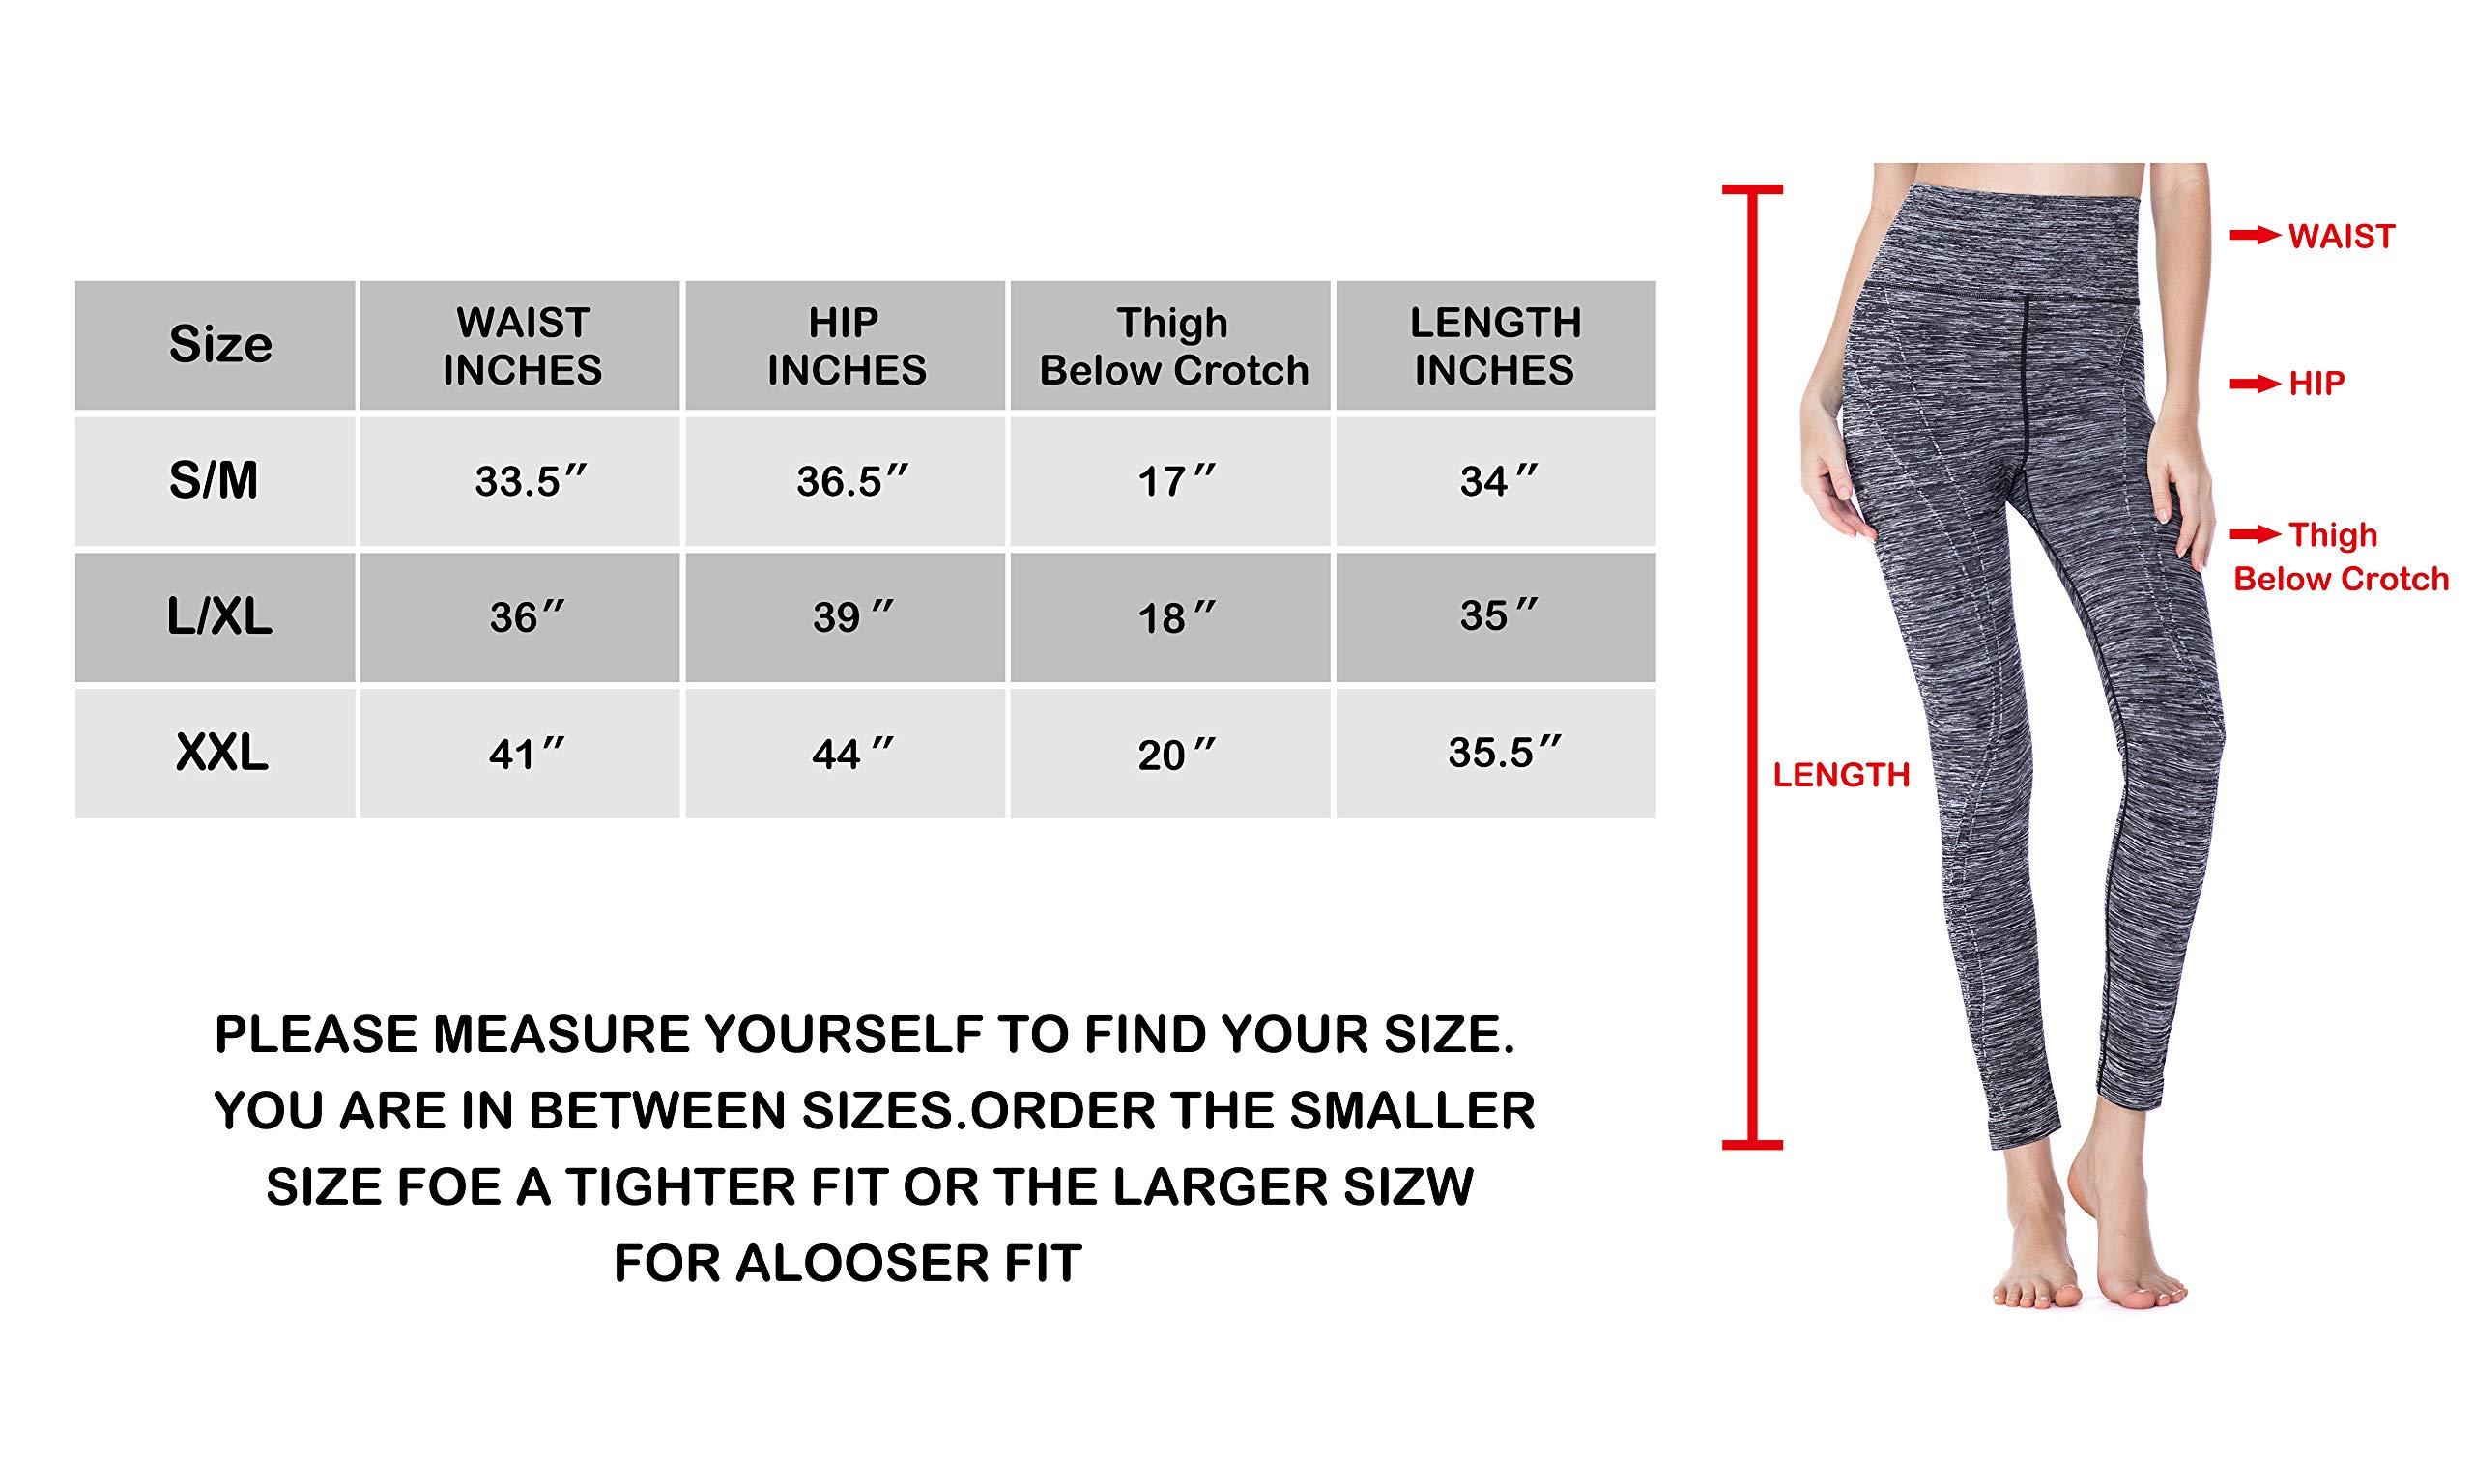 7cb0060157 Tirrinia Women Power Stretch Yoga Leggings Pants Plus Size High Waist  Workout Activewear Tights for Yoga